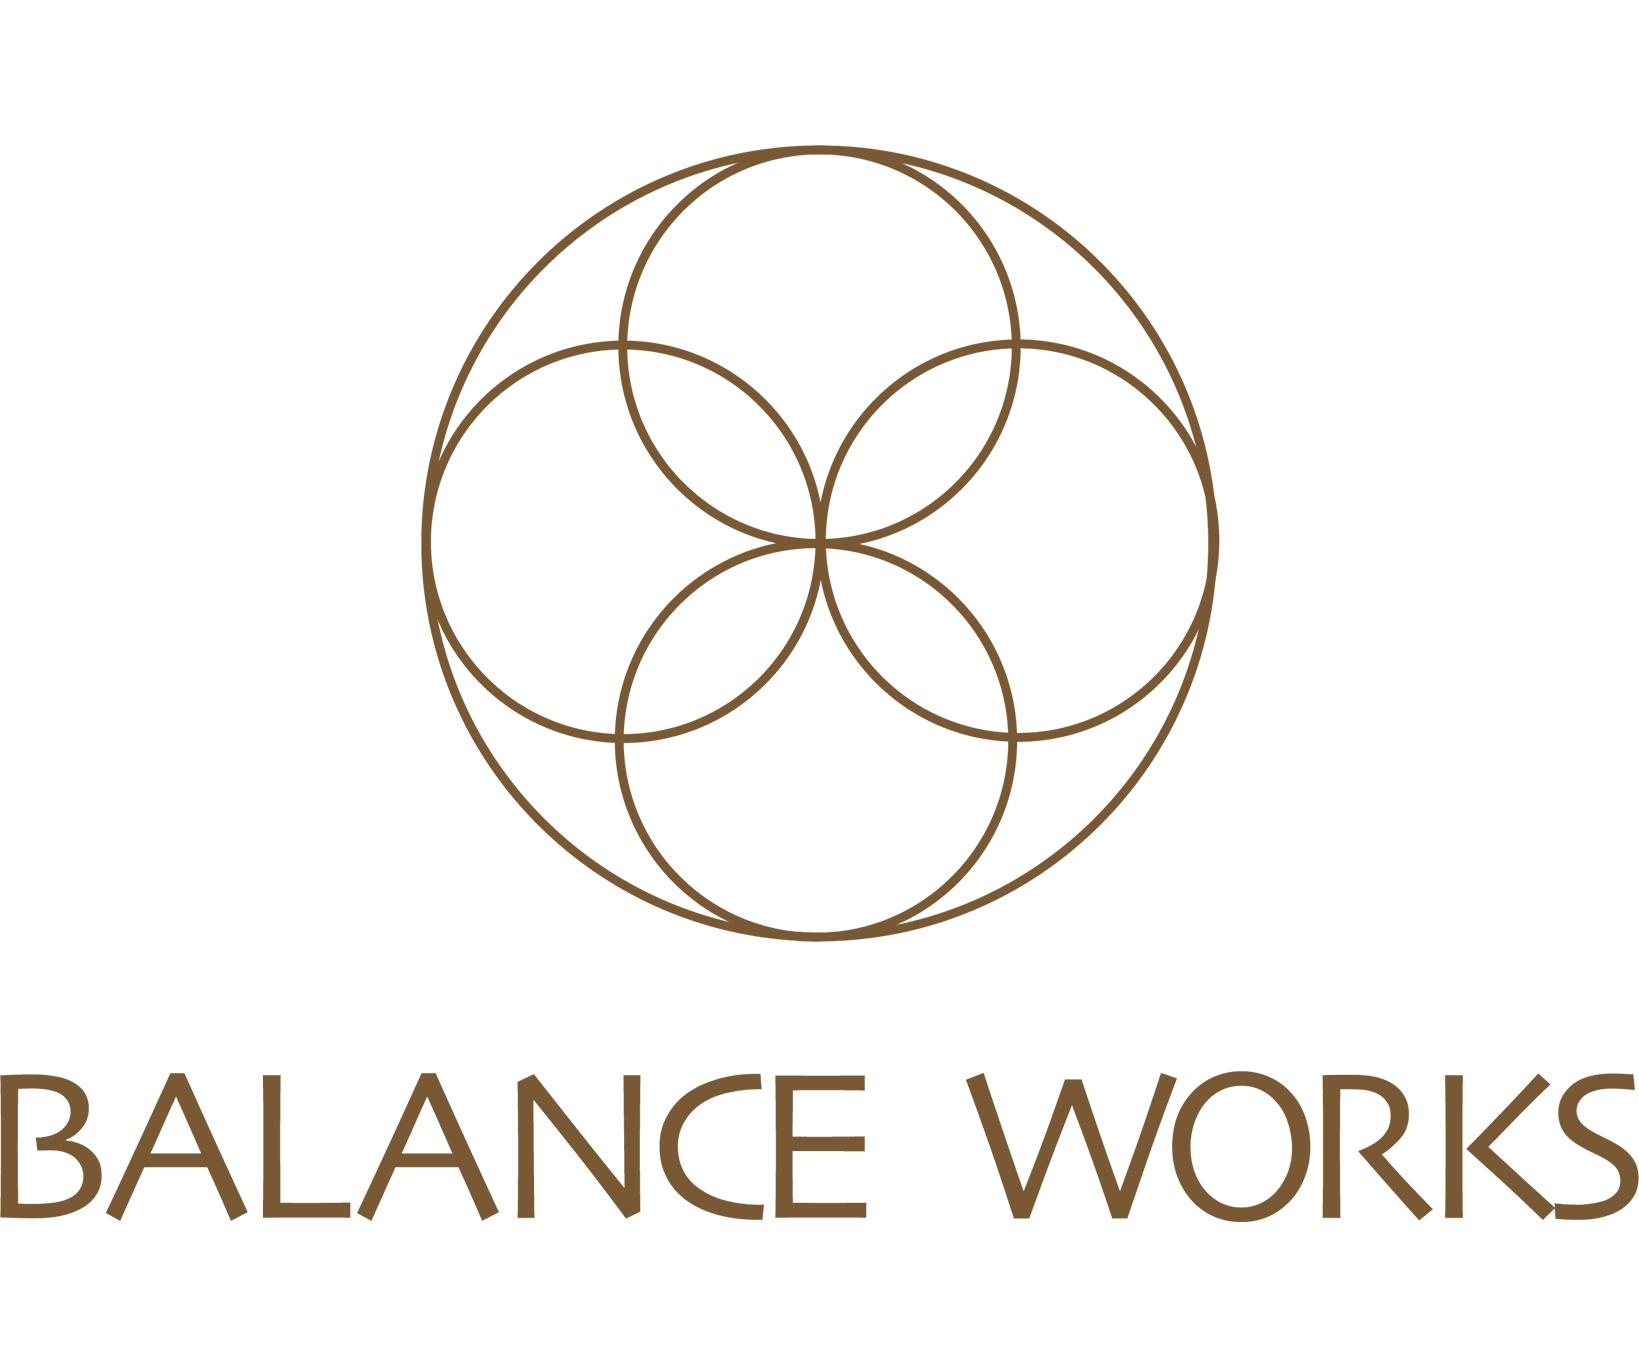 Balance Works